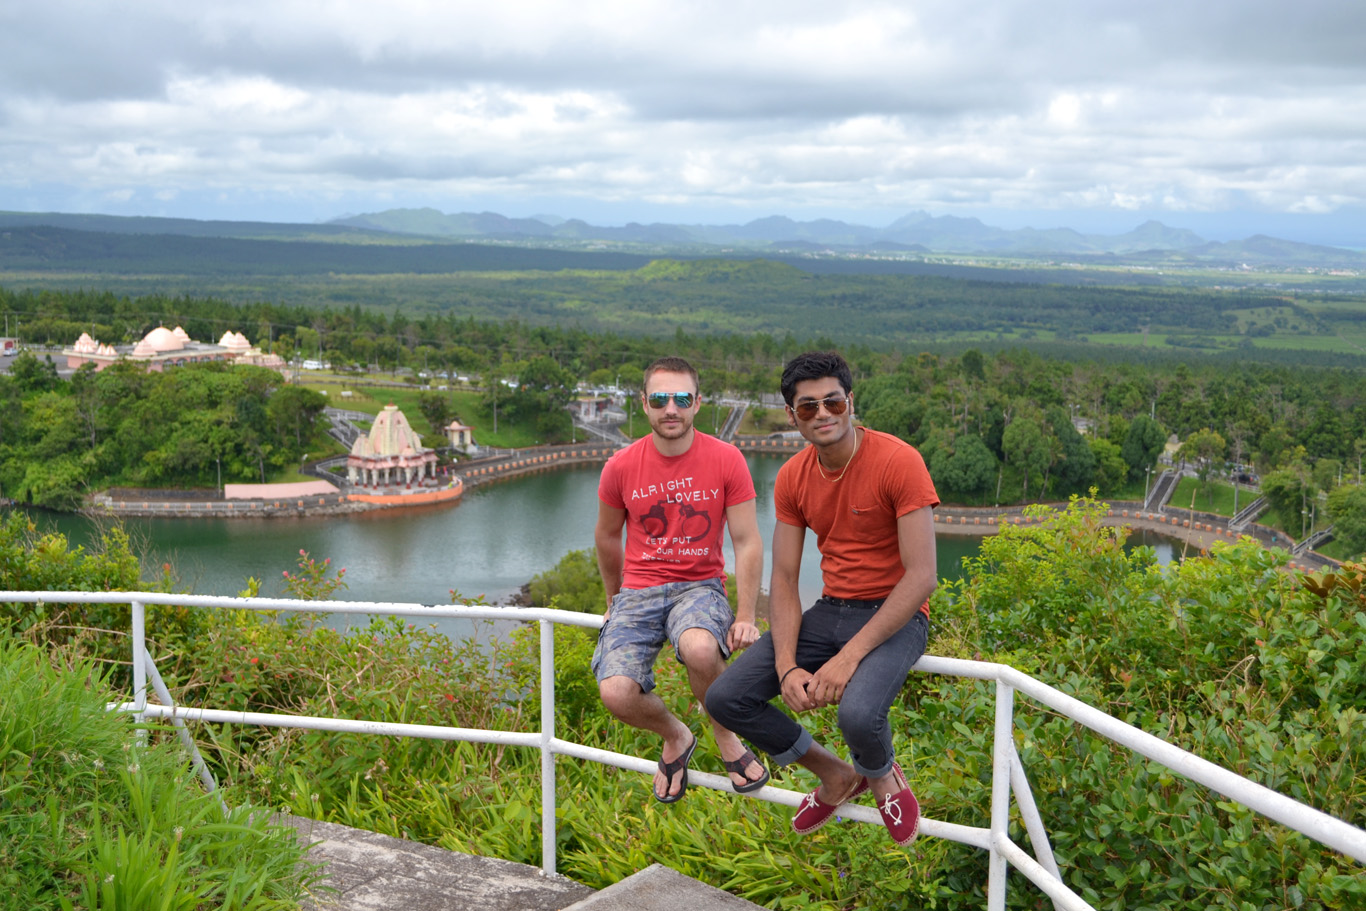 Admiring the views over Ganga Talao